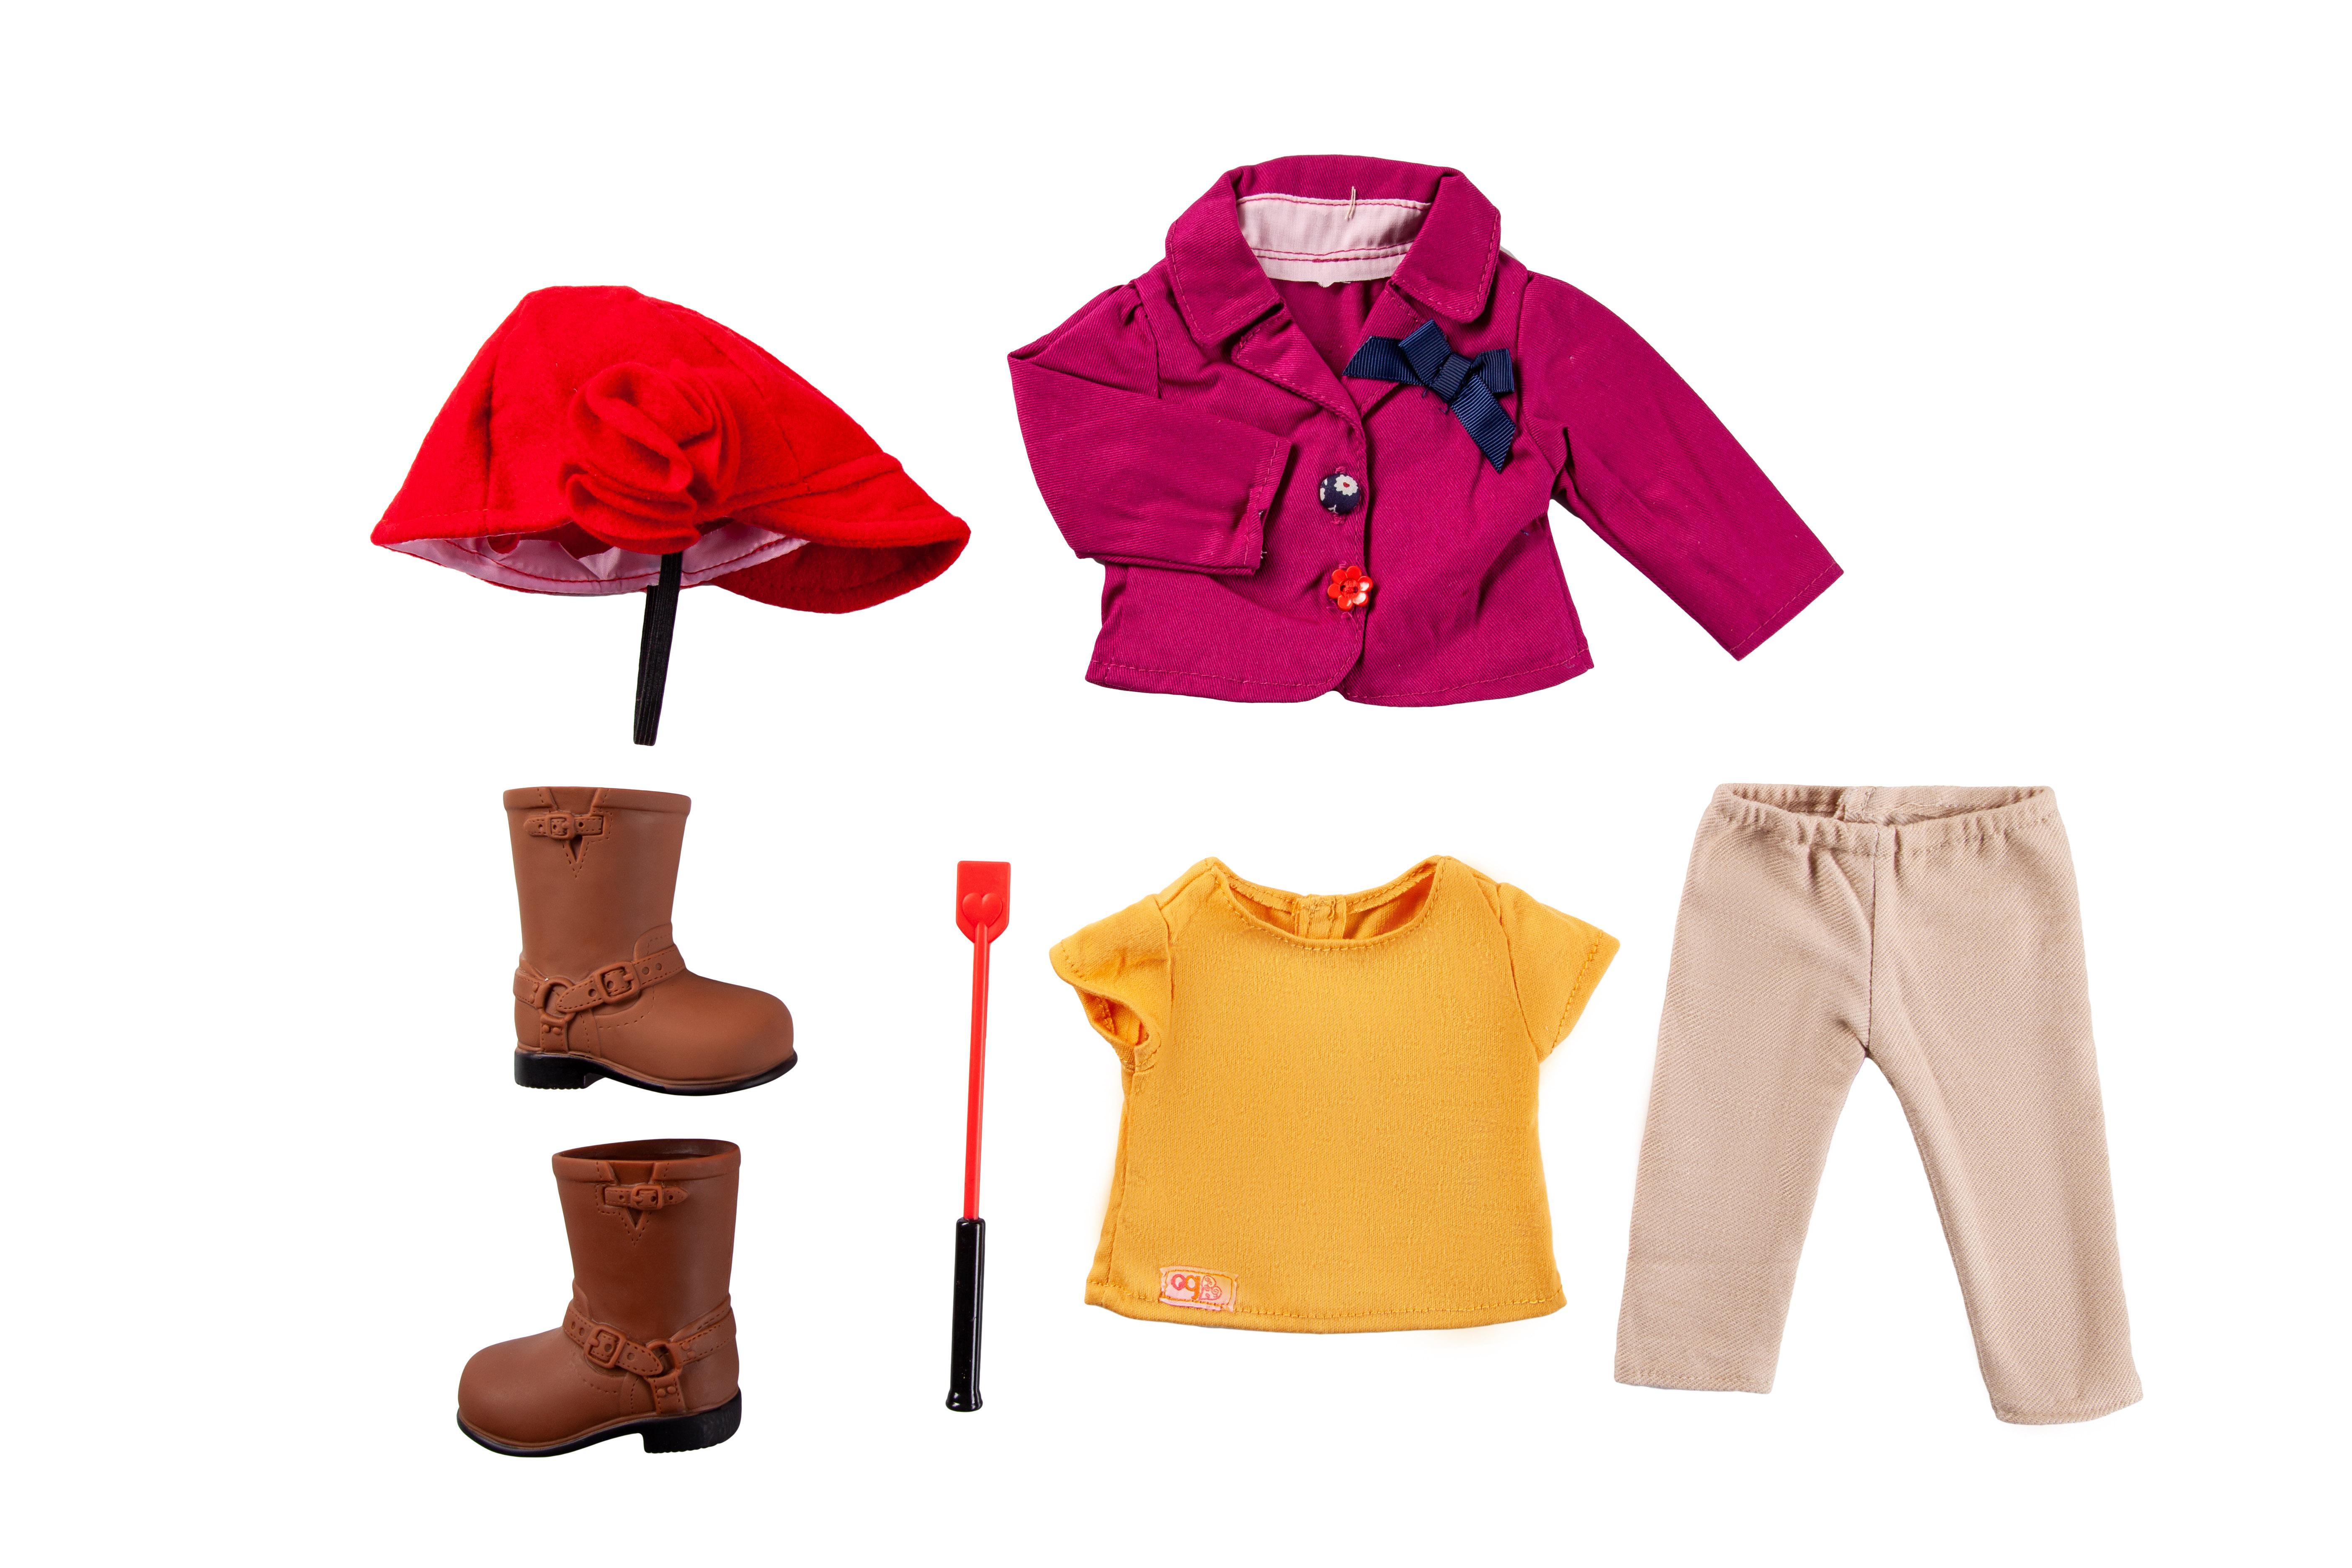 Our Generation Набір одягу для ляльок Deluxe для верхової їзди